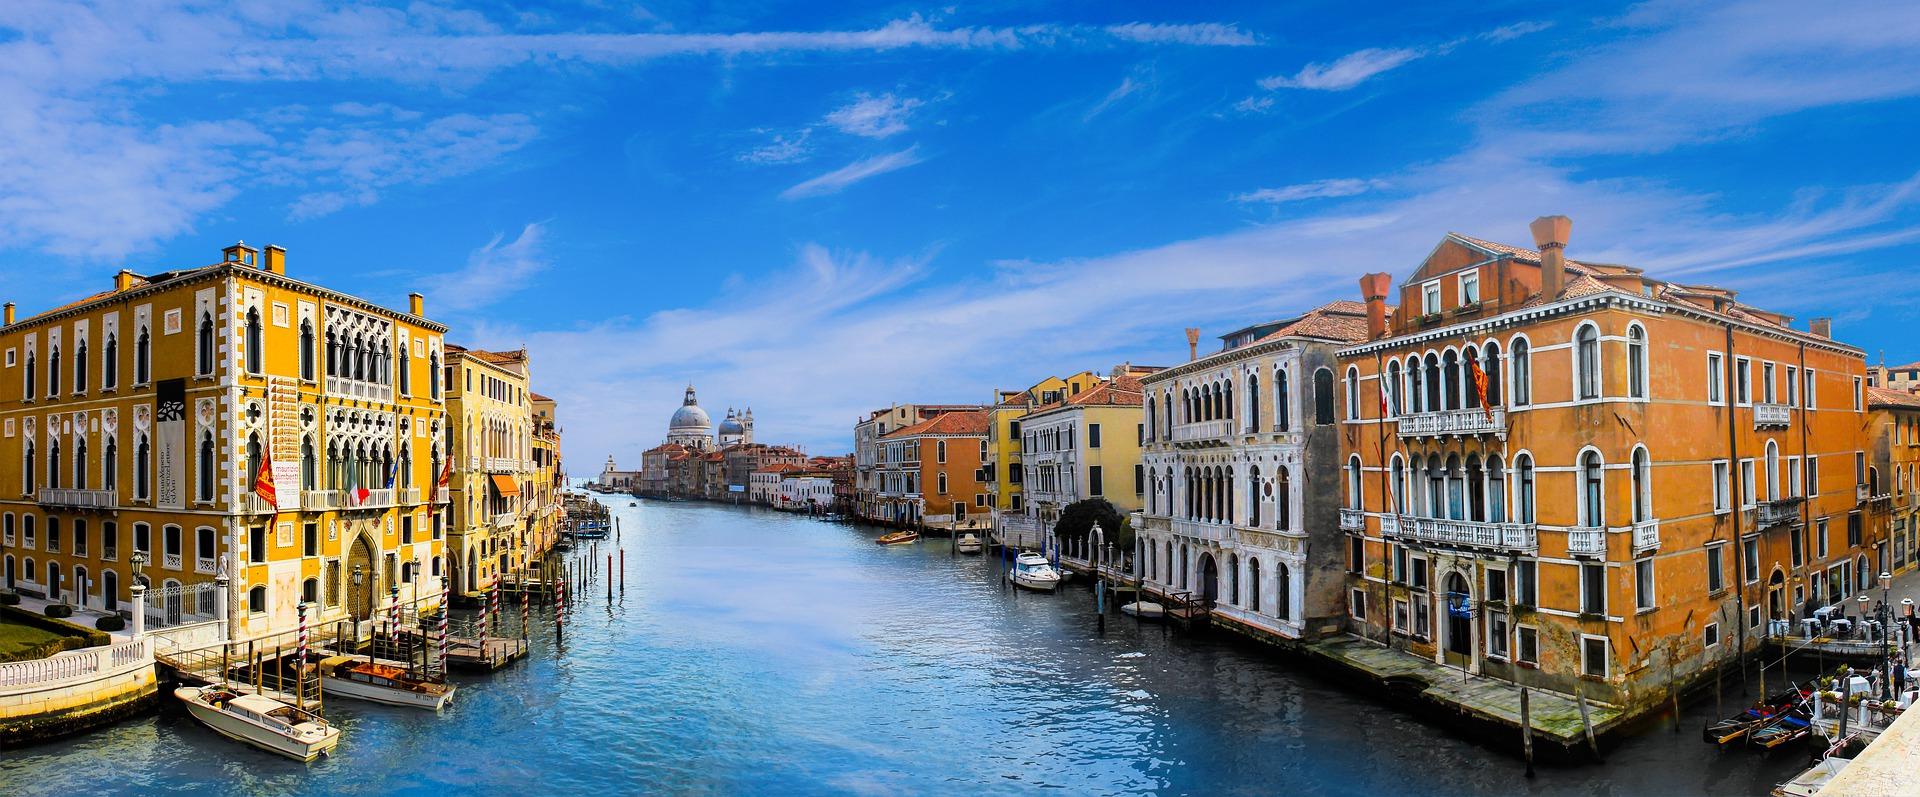 Venezia Panorama